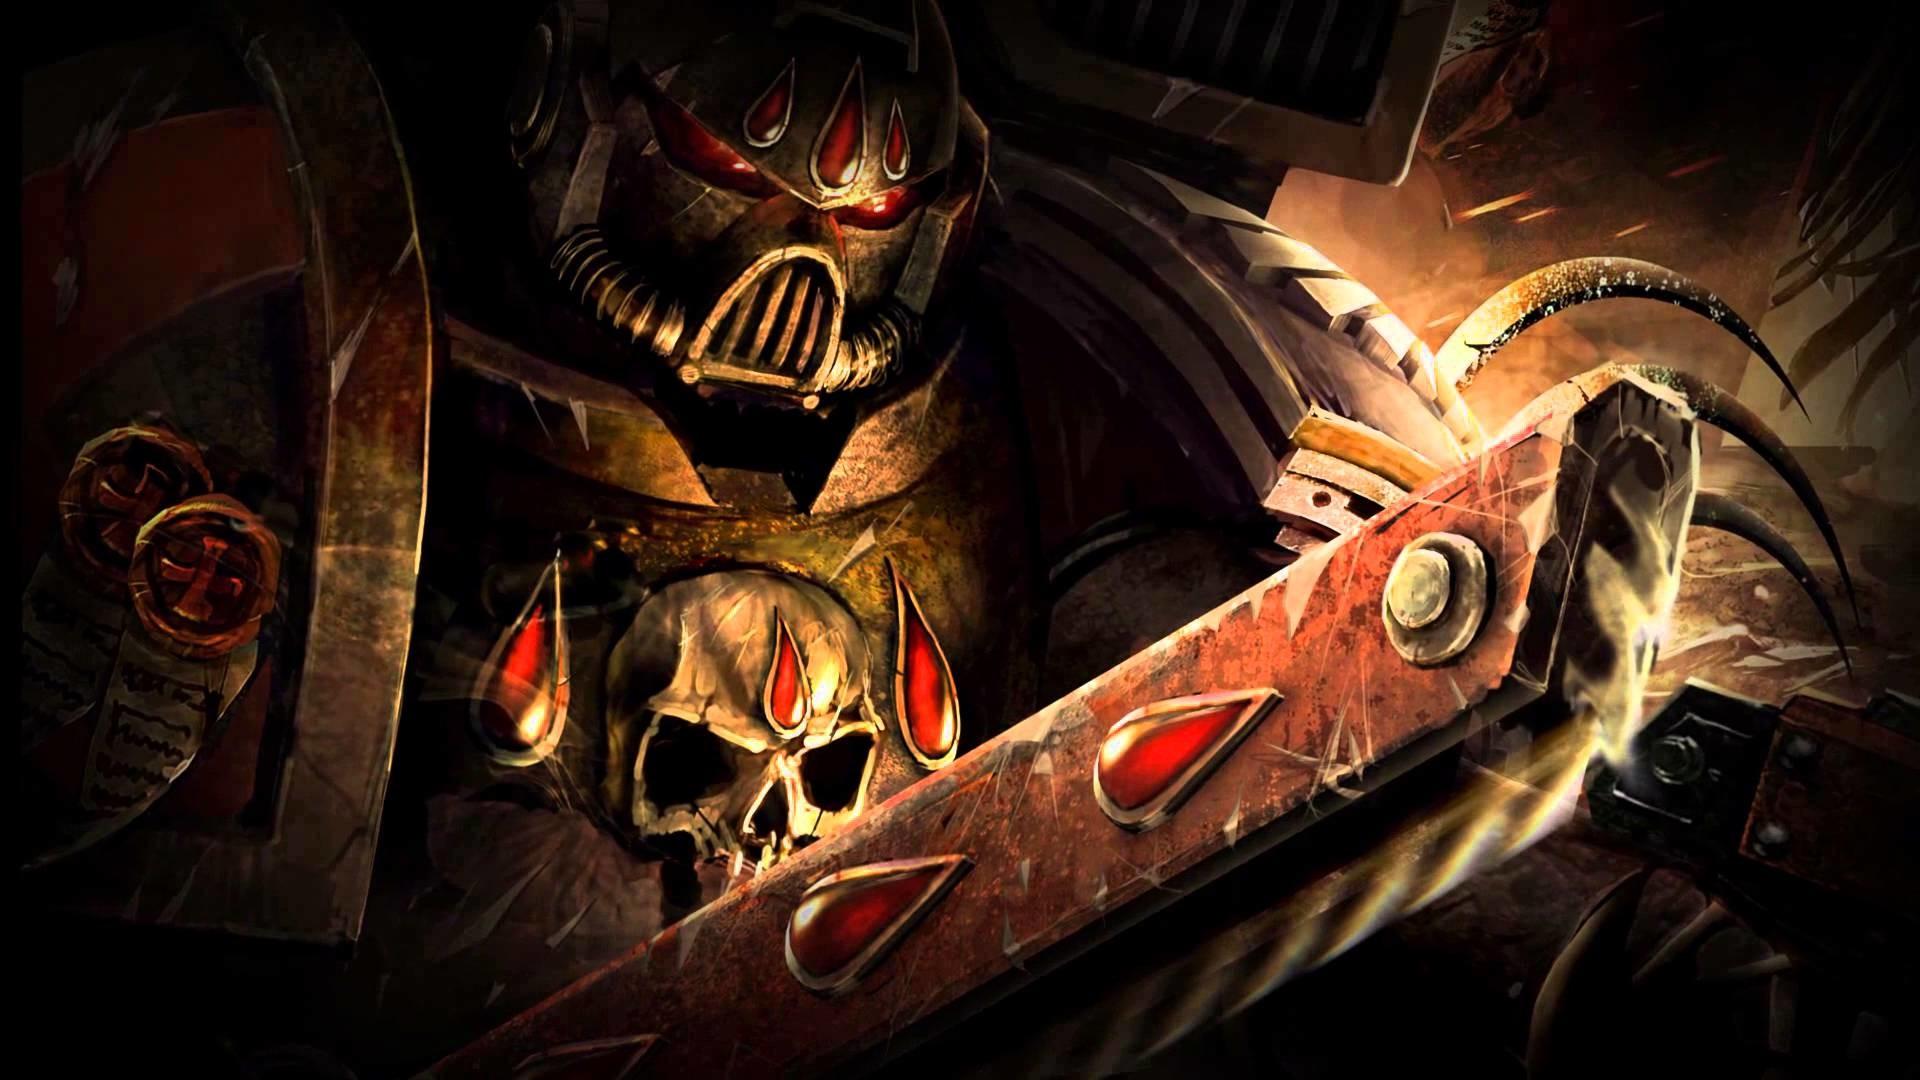 Warhammer 40k death company wallpaper - 1920x1080 Warhammer 40k Blood Angels Wallpaper Wallpapersafari